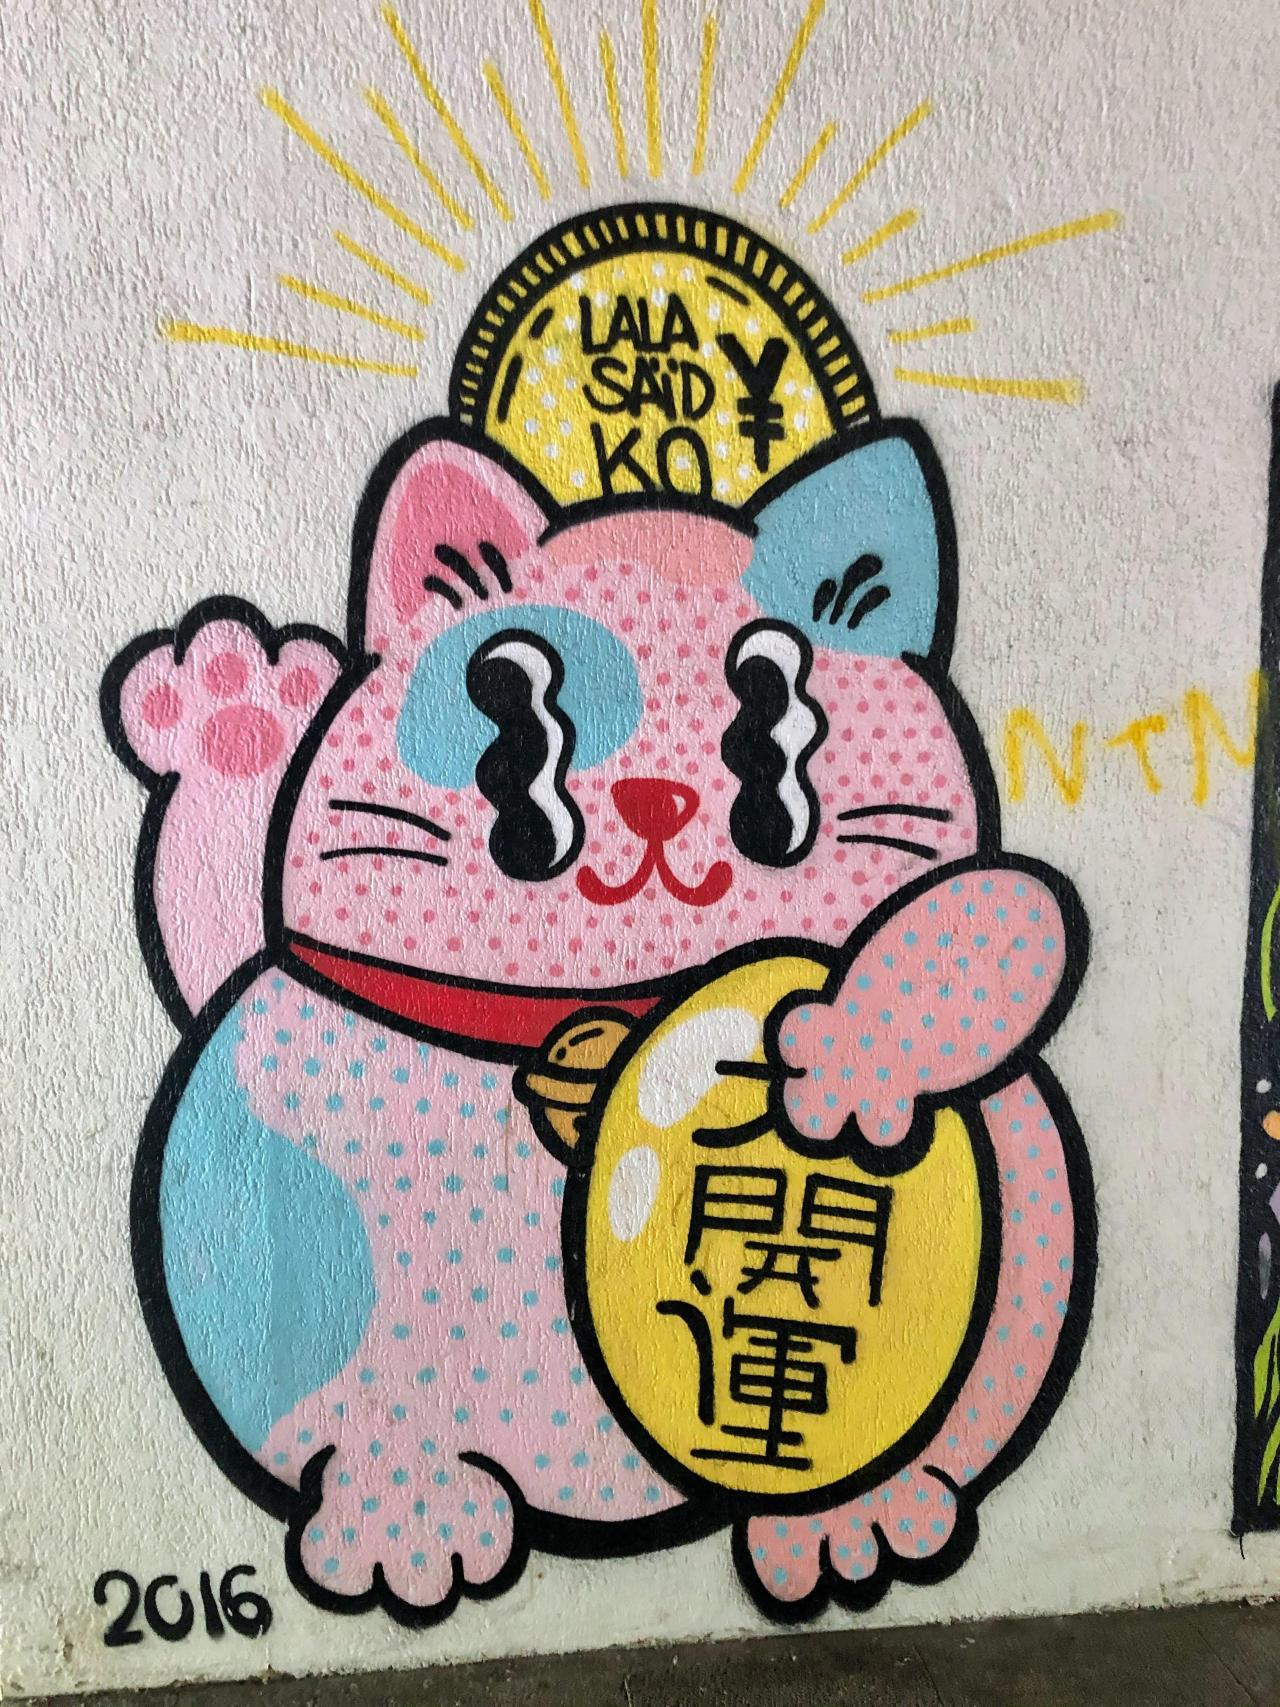 [OC] Street-art in Vitry-Sur-Seine: a cat by Lalasaïdko at 2 Avenue de lAbbe Roger Derry #street art#street#art#graffiti#photography #photographers on tumblr #city#lost places#lost sou